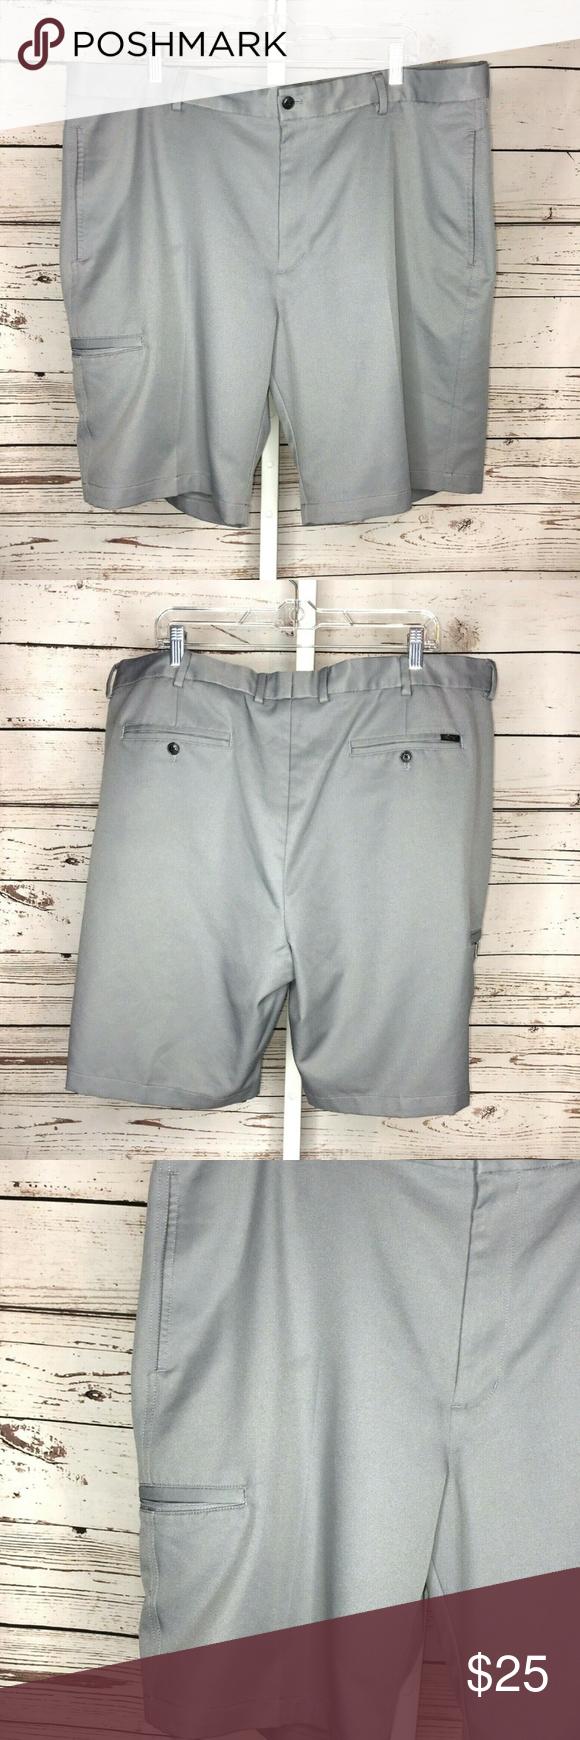 Greg Norman Gray Golf Shorts Size 40 Golf Shorts Shorts Clothes Design